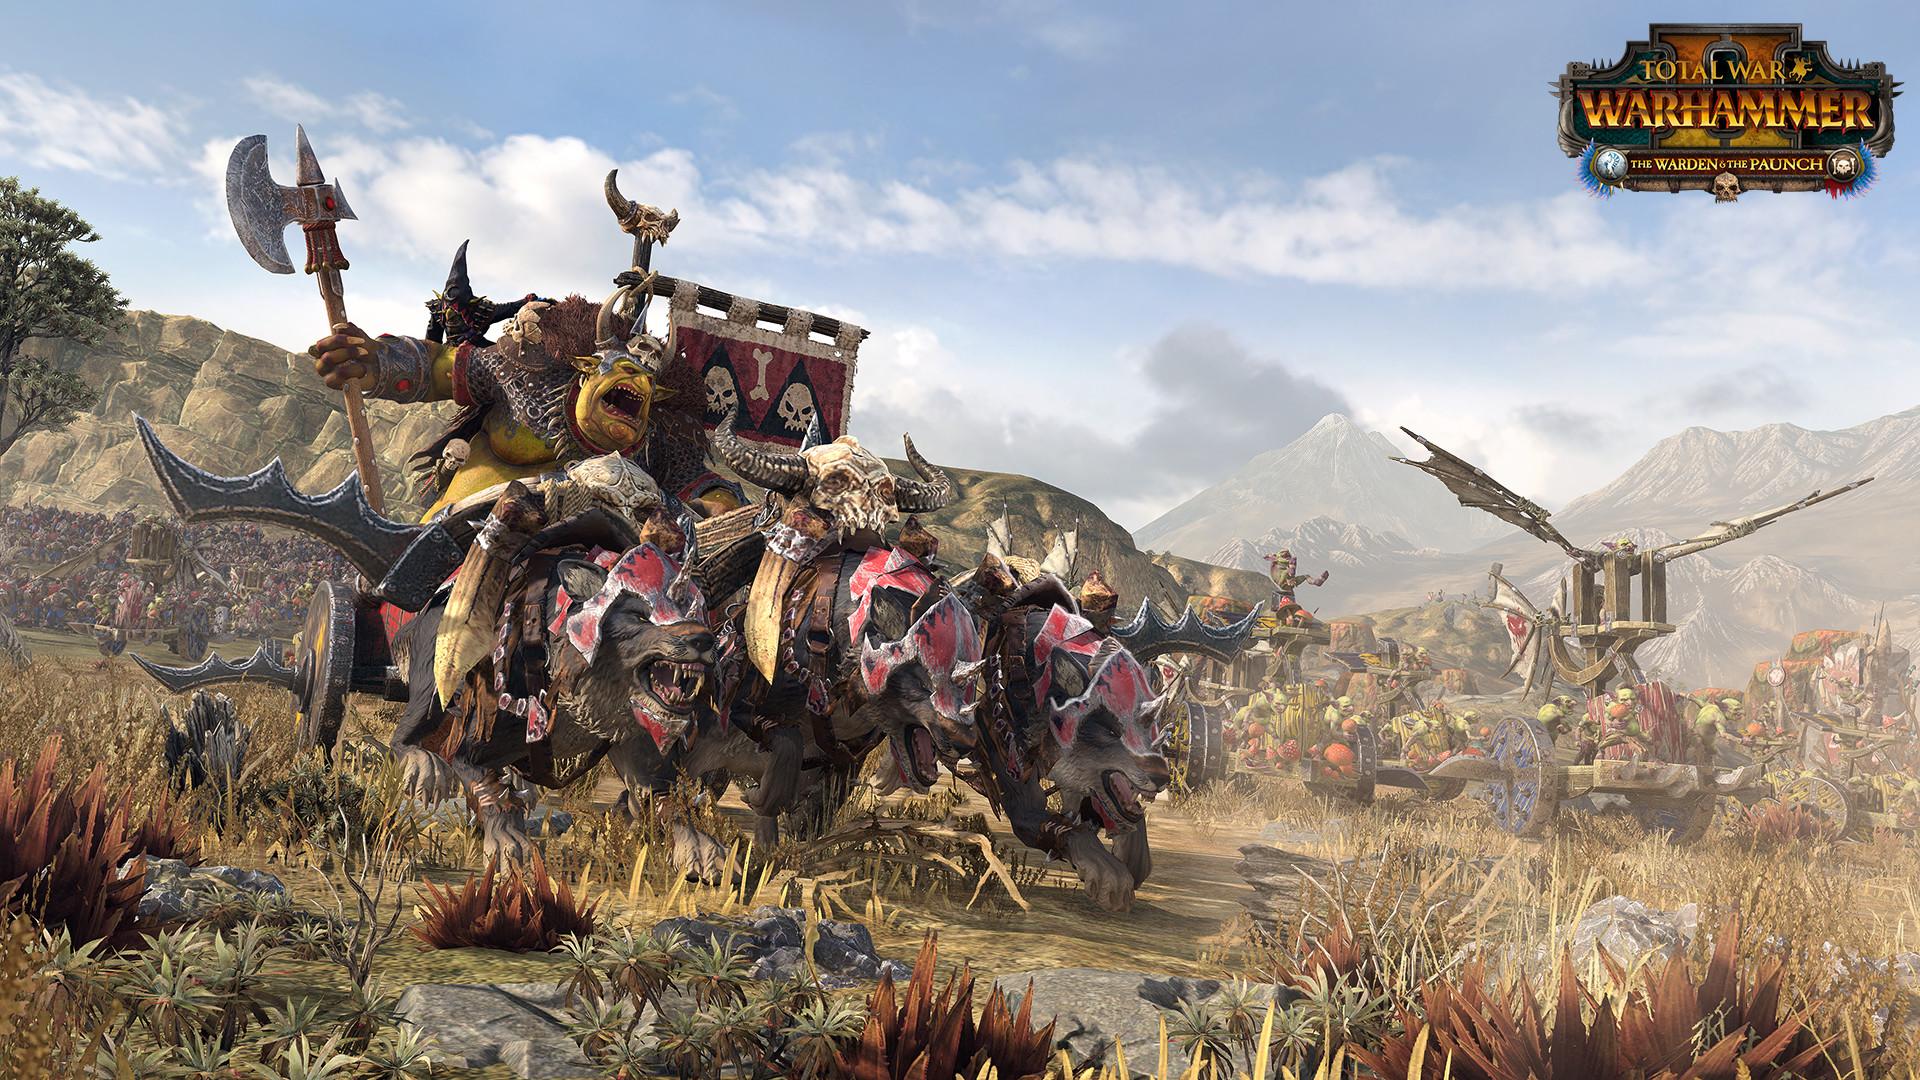 Скриншоты дополнения The Warden & The Paunch для Total War: Warhammer 2